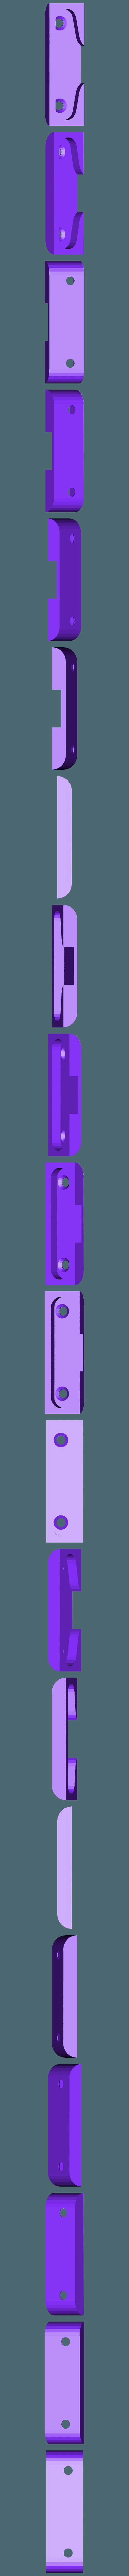 MONTANT GACHE FENETRE ARGENTA 010.stl Download free STL file AMOUNT OF WINDOW WASTE SILVER WINDOW 010 • 3D print object, laluyauxeric